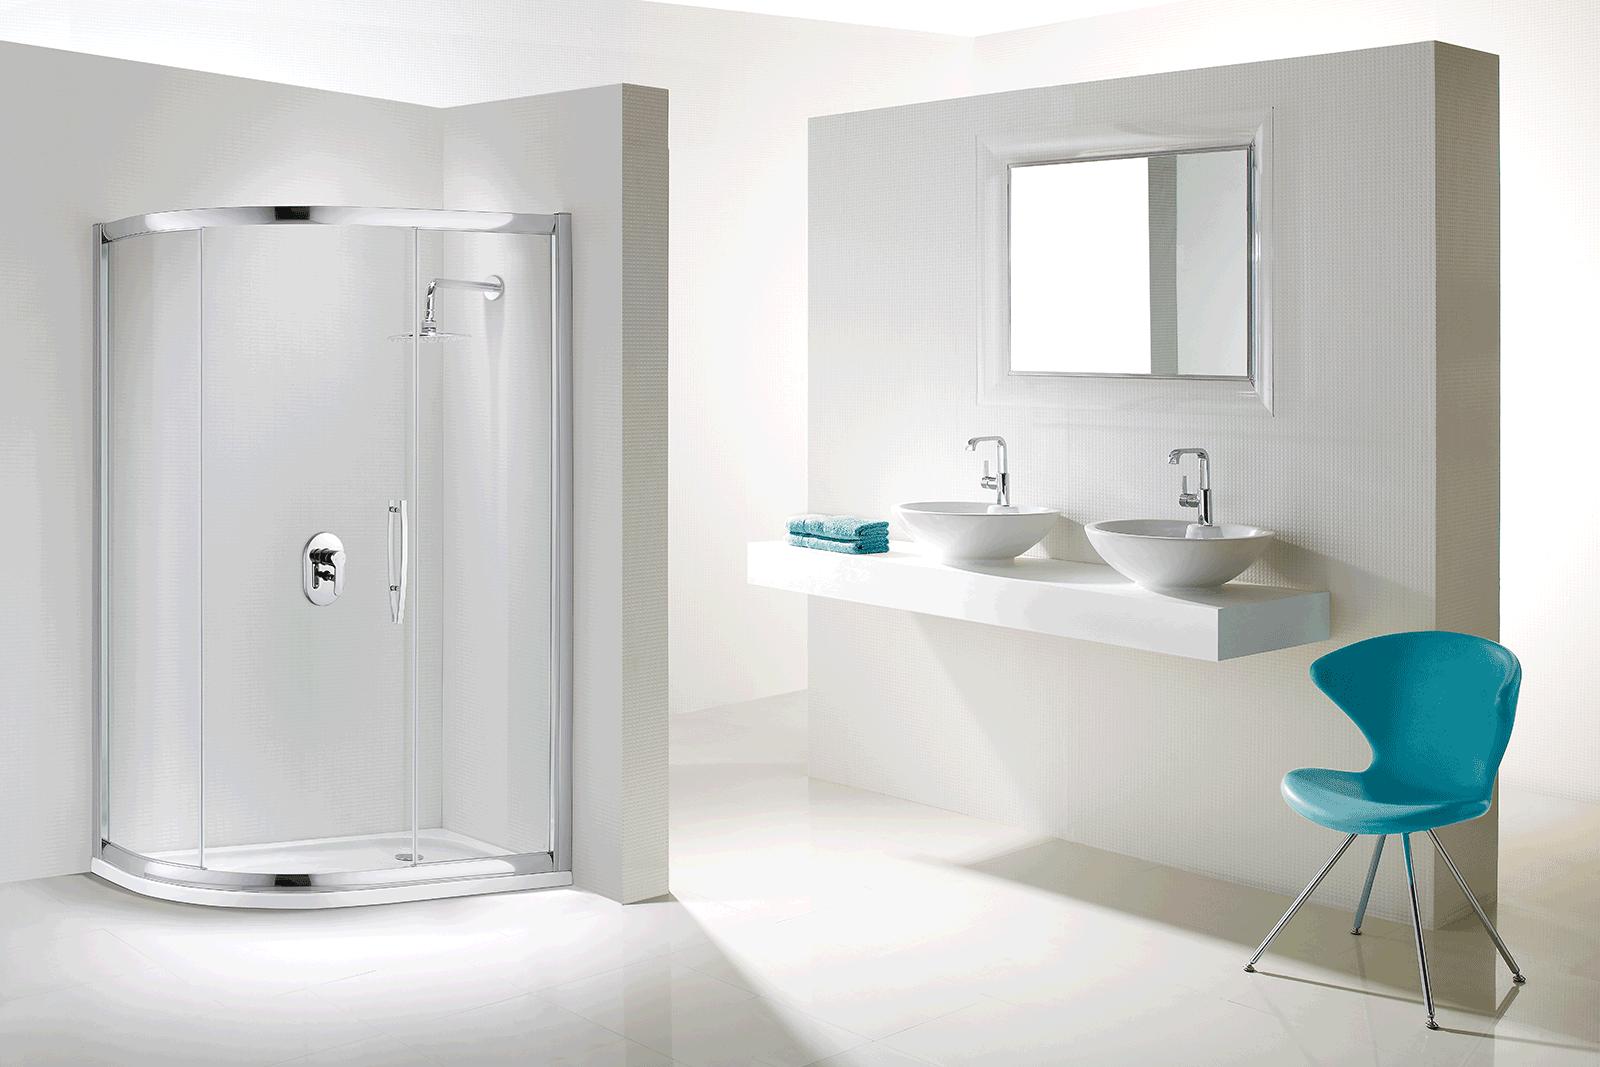 flair-namara-shower-enclosure